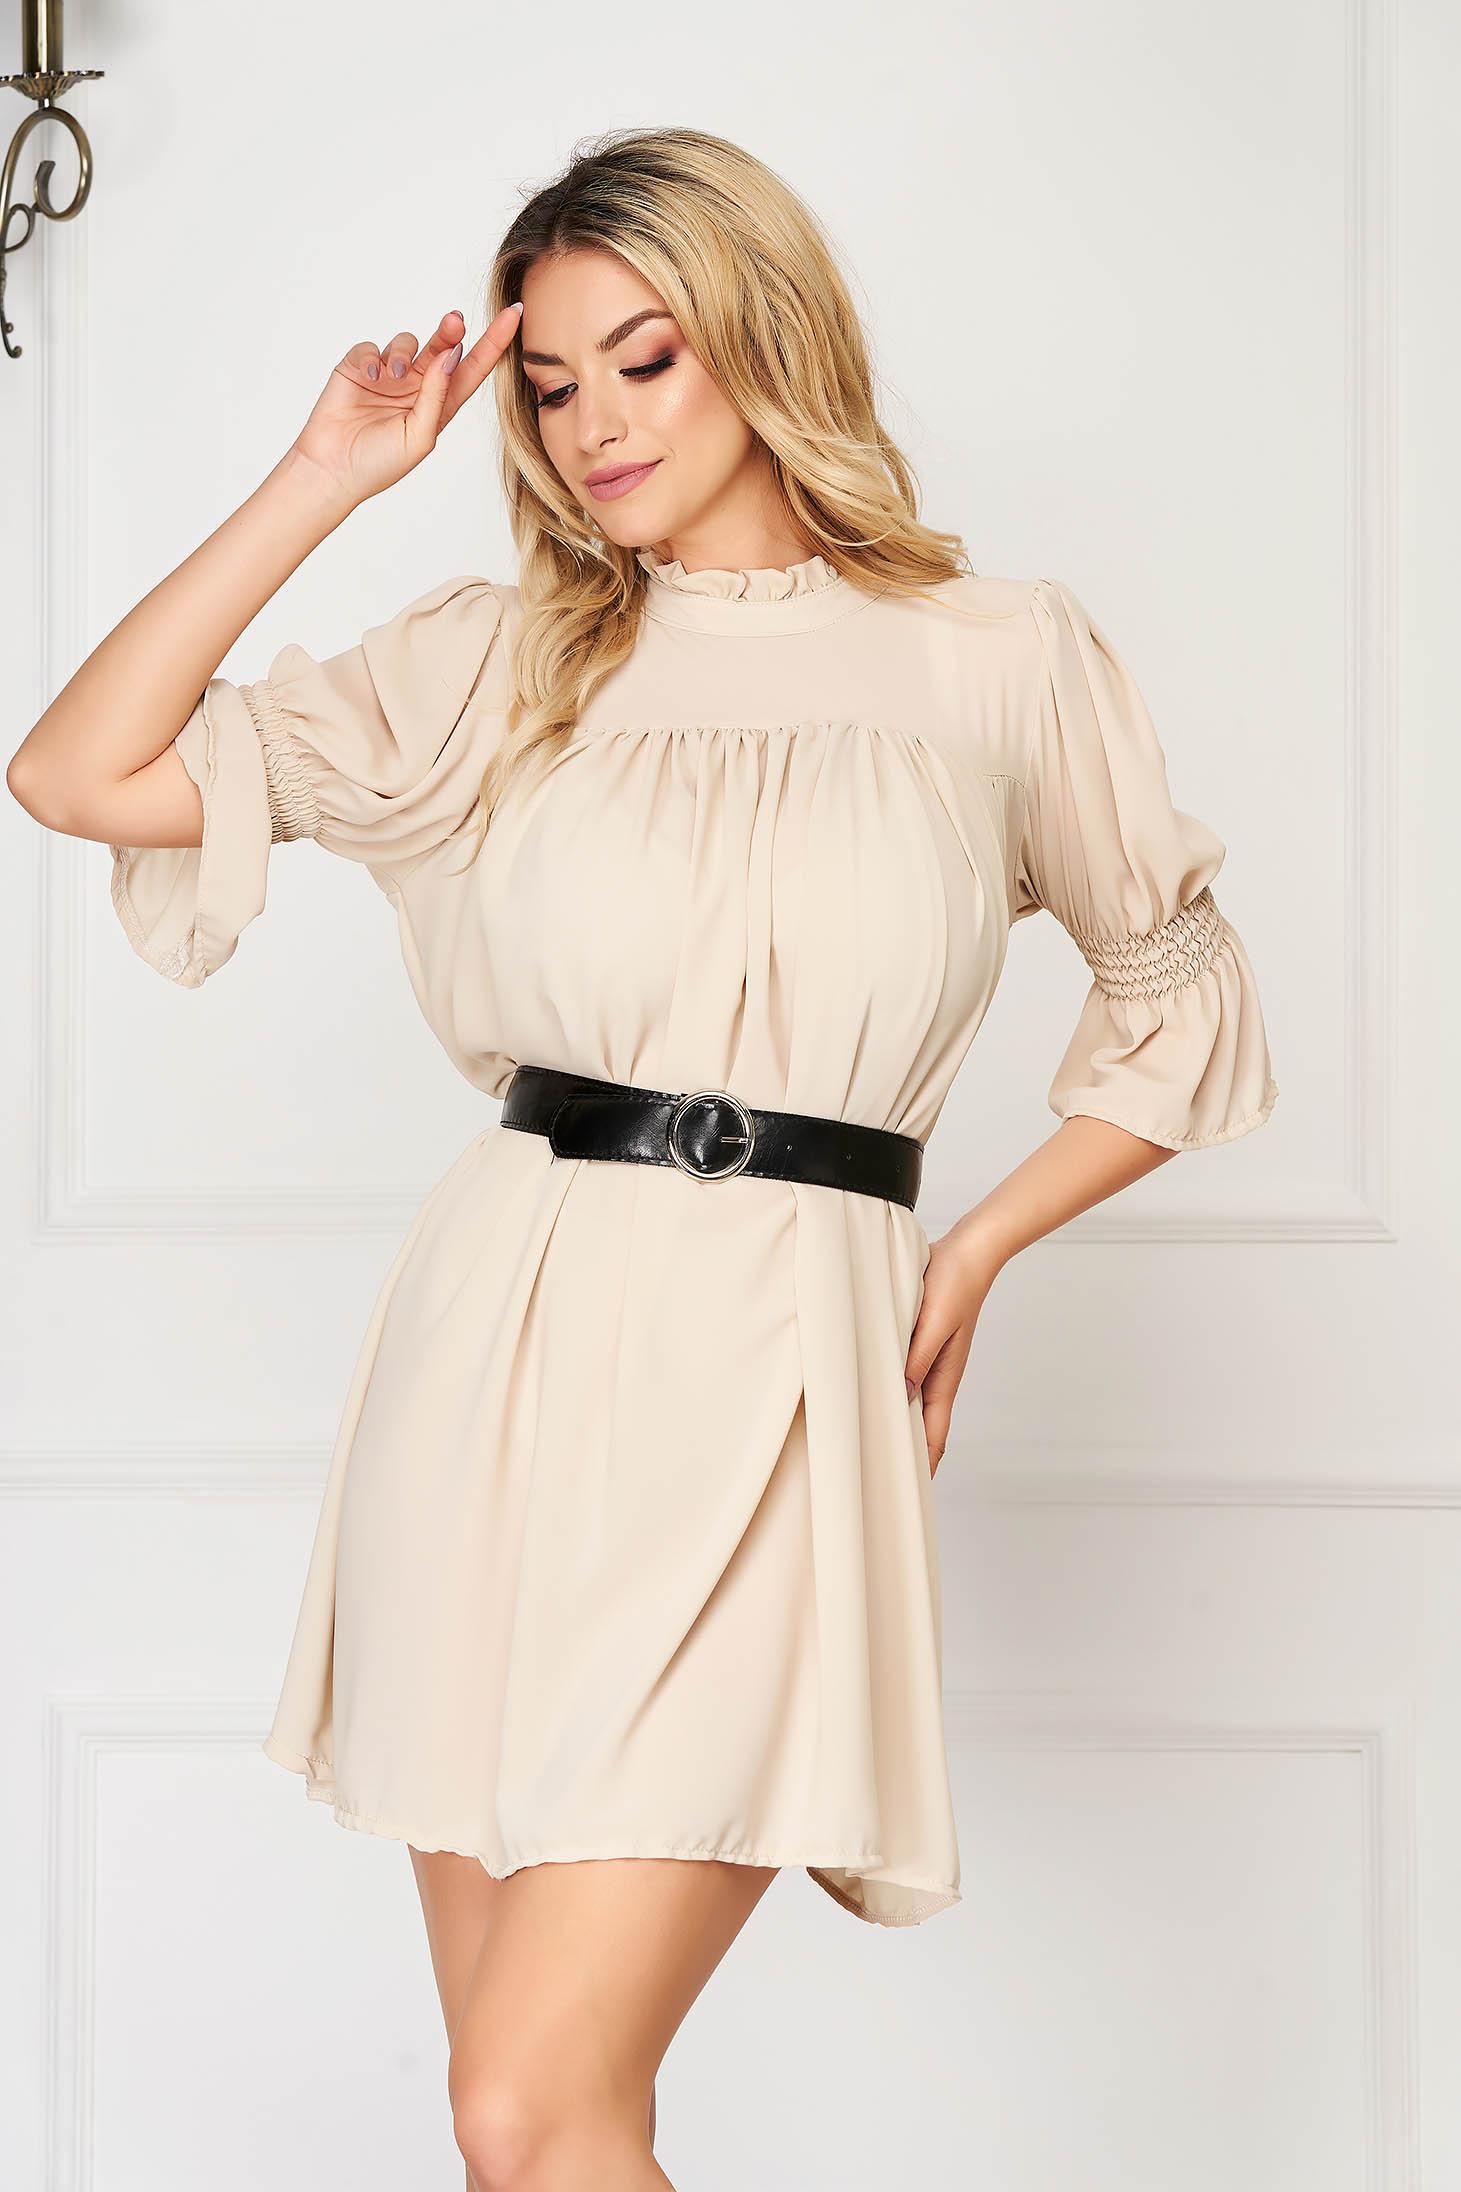 Cream dress short cut daily flared from veil fabric ruffled collar